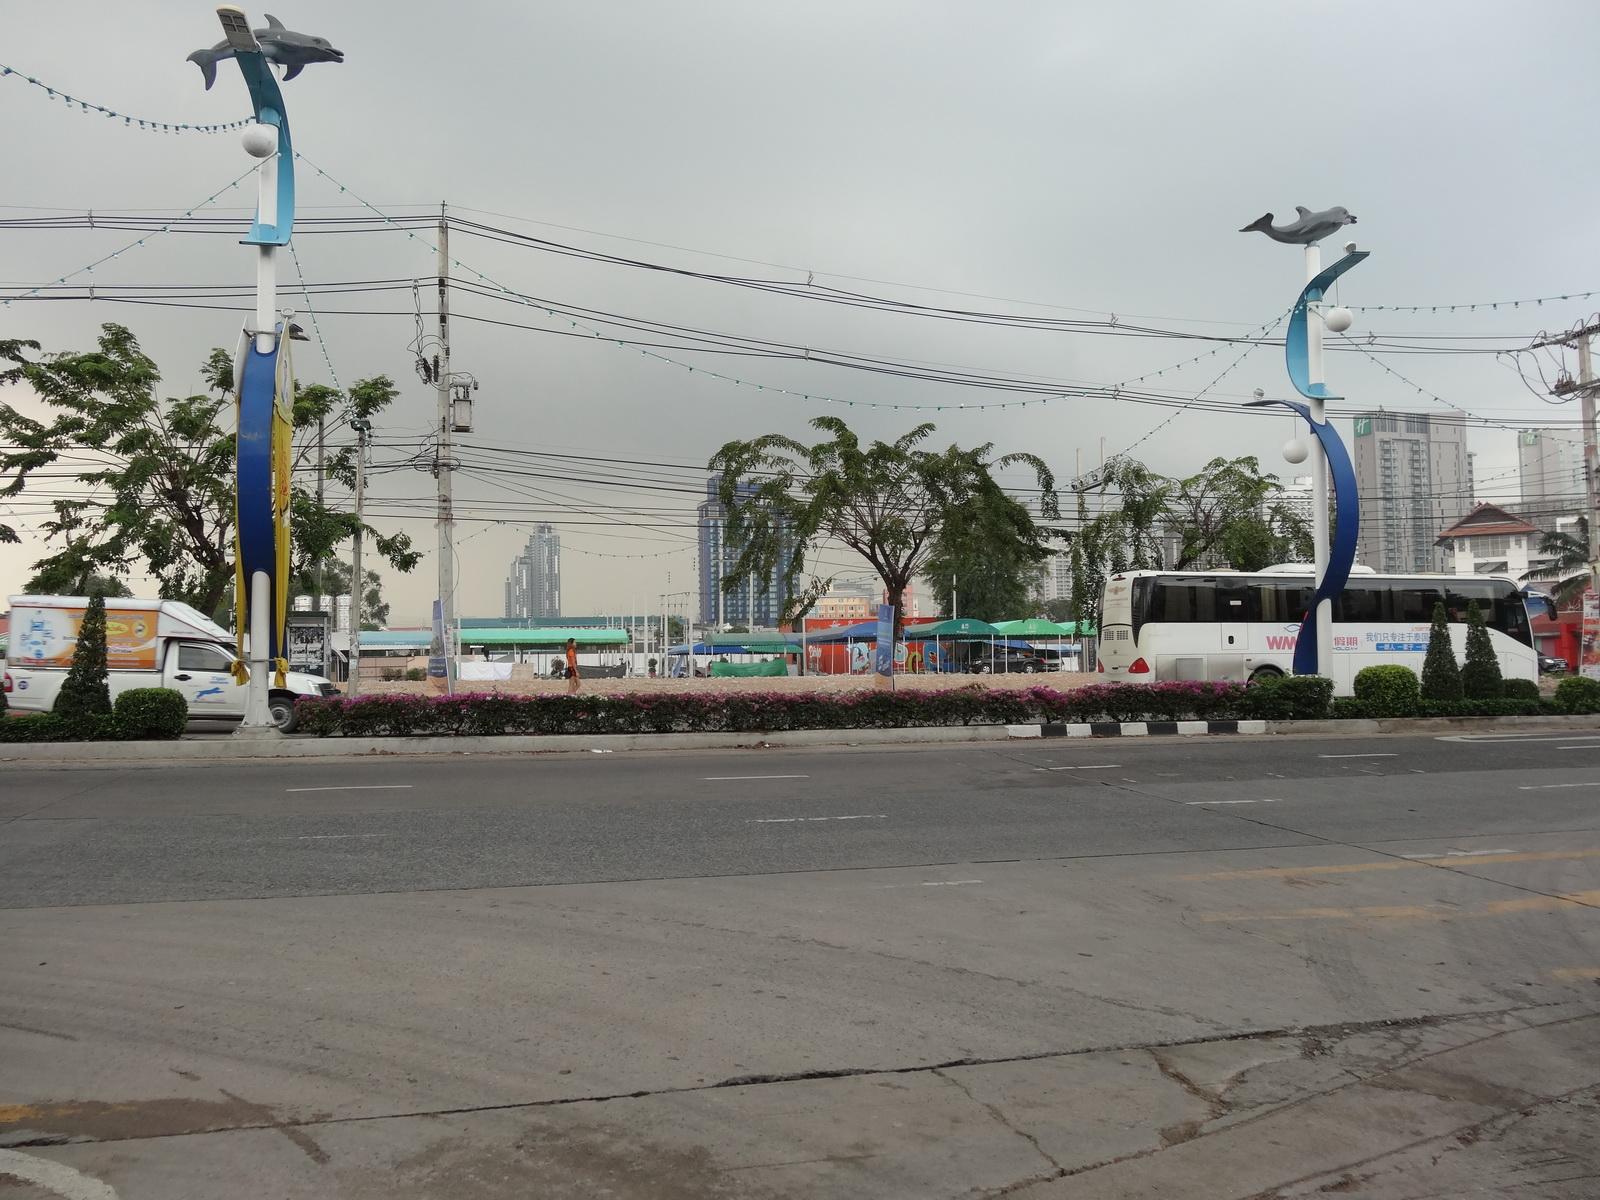 07 Pattaya 001